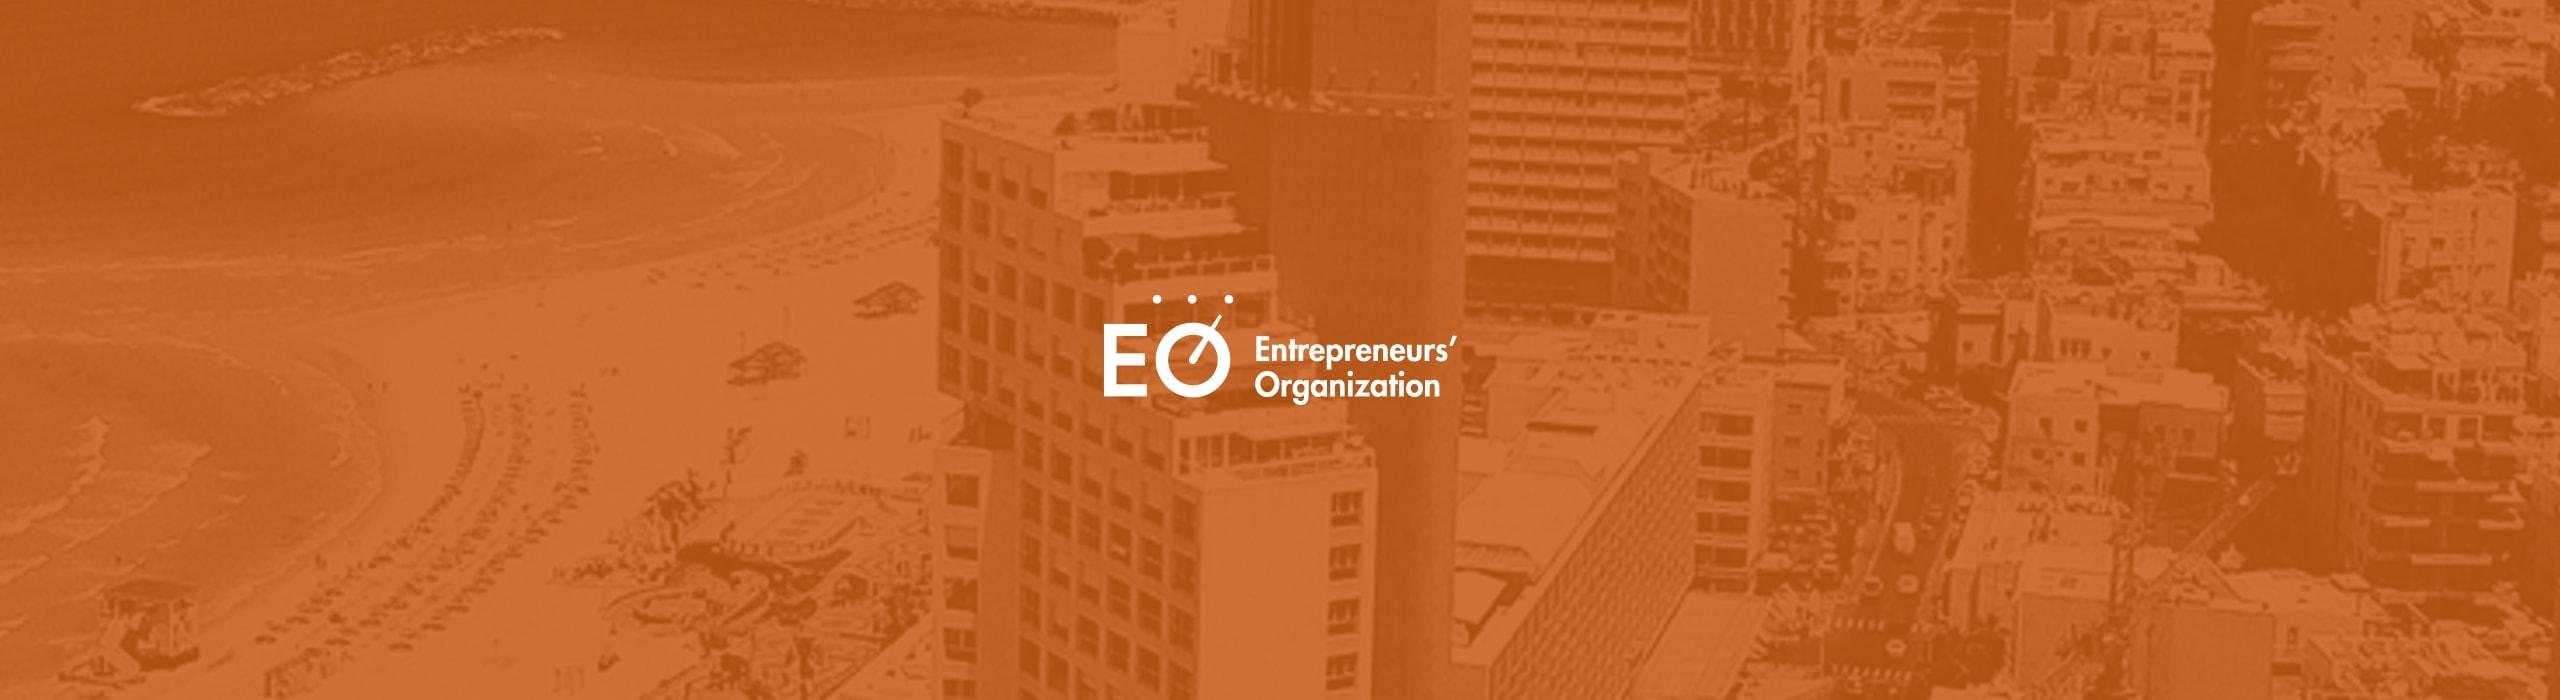 EO Israel - natie-eo-israel-logo-bg - Natie Branding Agency